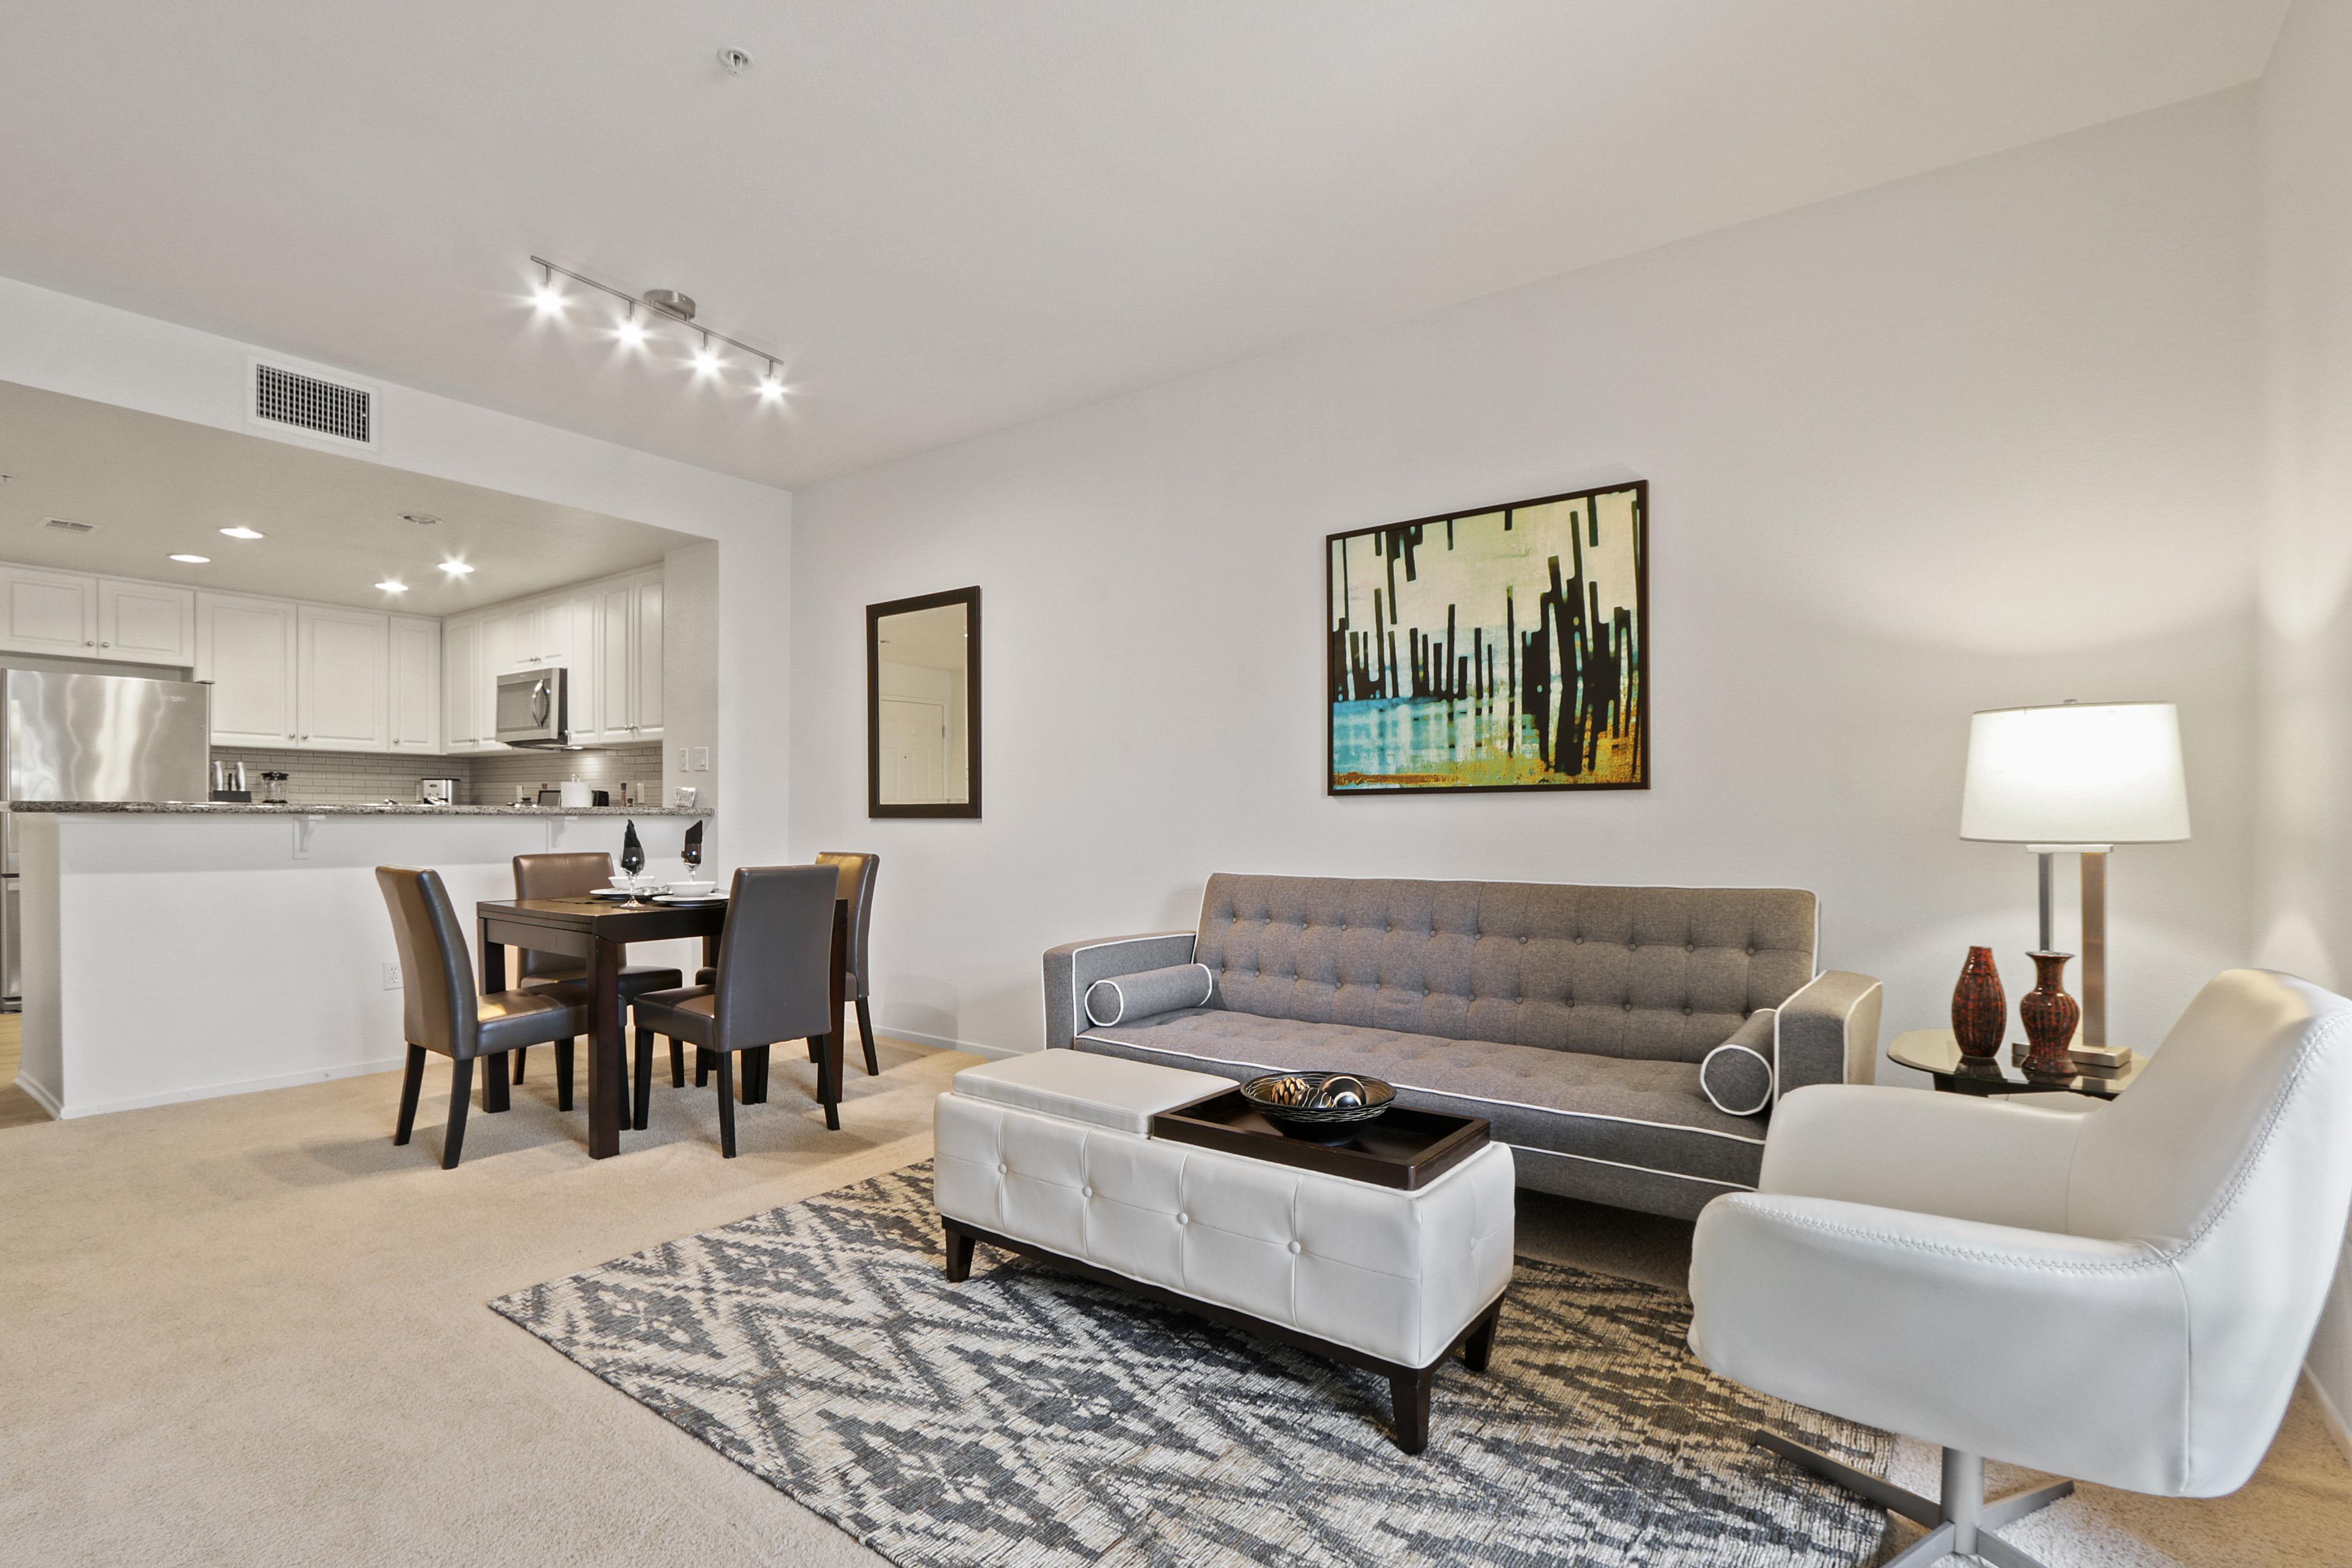 image 9 furnished 1 bedroom Apartment for rent in Irvine, Orange County